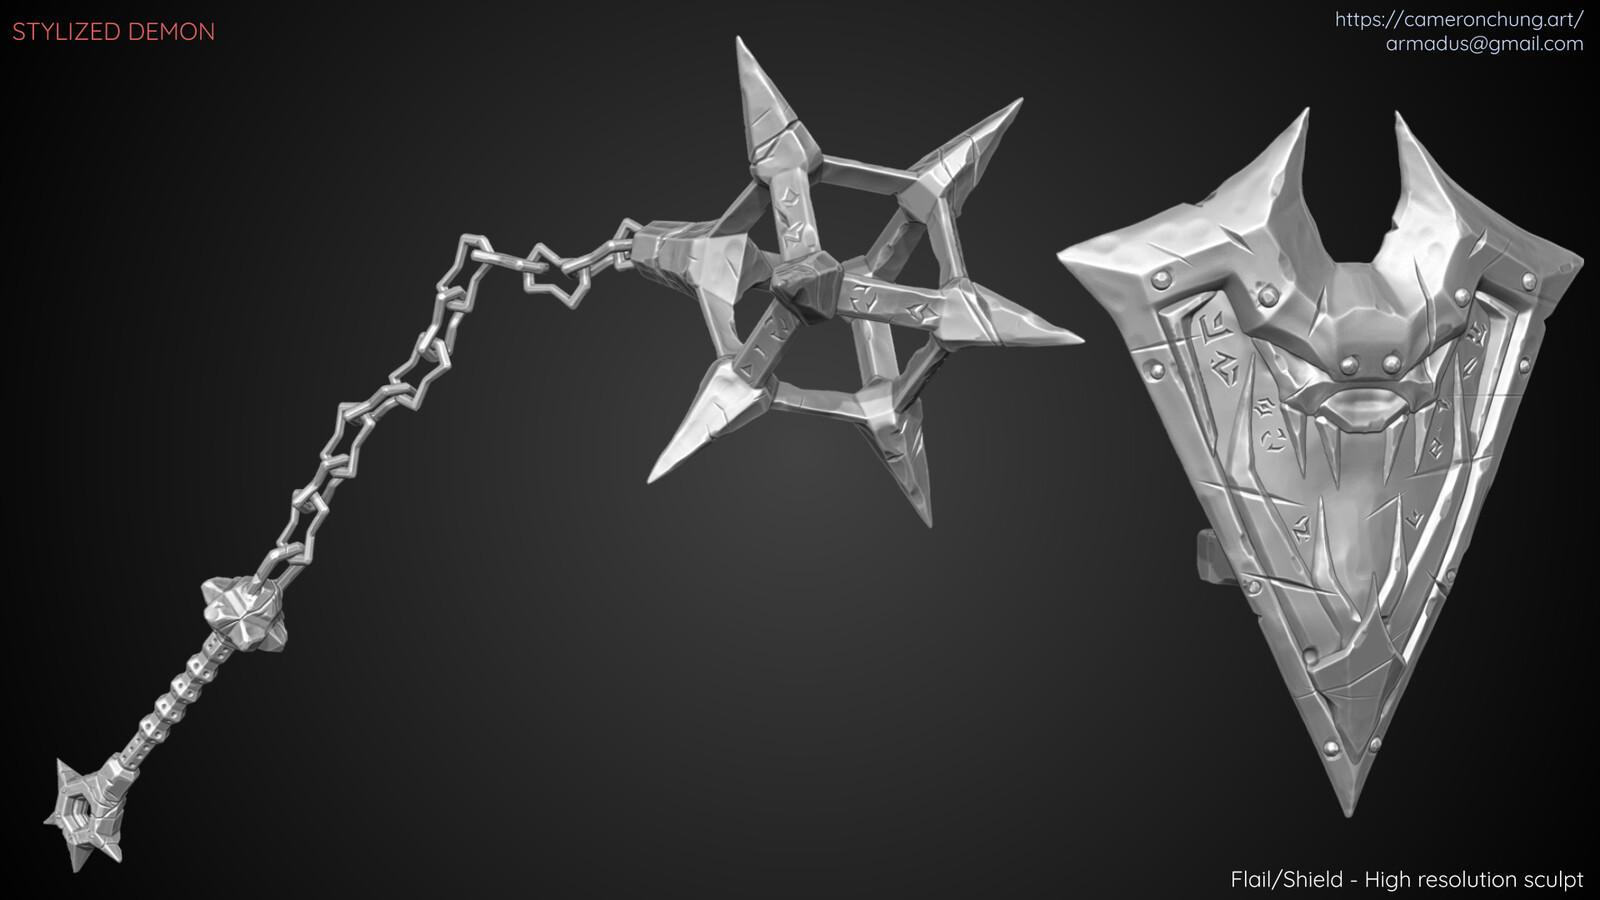 Flail / Shield - Zbrush sculpt